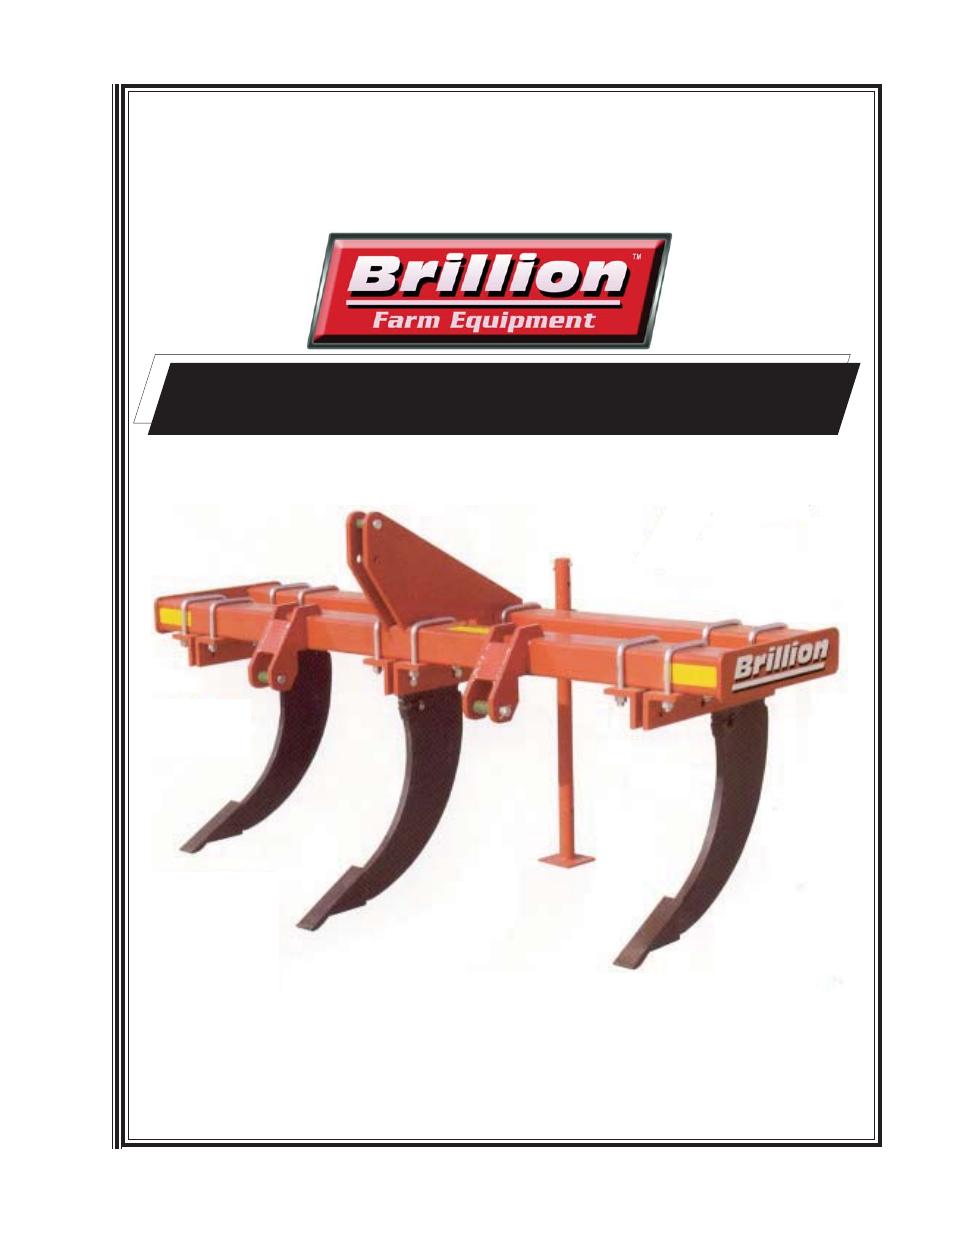 Landoll SCPH-33 Subsoil Chisel Plow User Manual | 18 pages | Also for:  SCP-33 Subsoil Chisel Plow, SCPH-23 Subsoil Chisel Plow, SCP-23 Subsoil  Chisel Plow